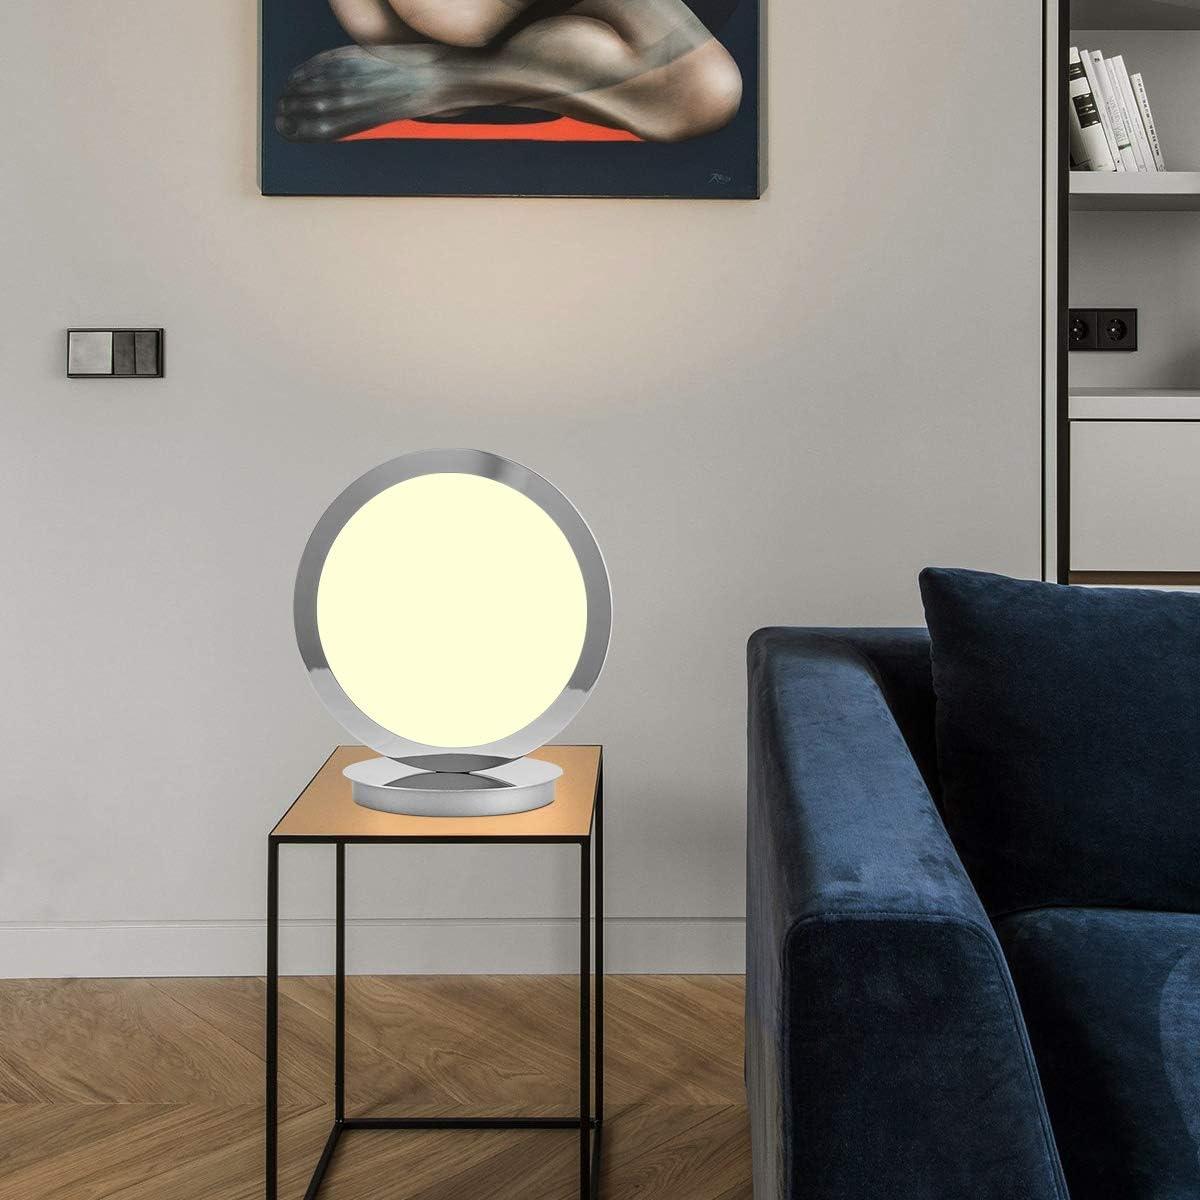 120V 8W 3000K Warmlight LED Modern Table Lamp, Contemporary LED Desk lamp for Living Room, Bedroom, Dressing Room, Reading Room, Office Chrome Finish Class A Energy-Saving